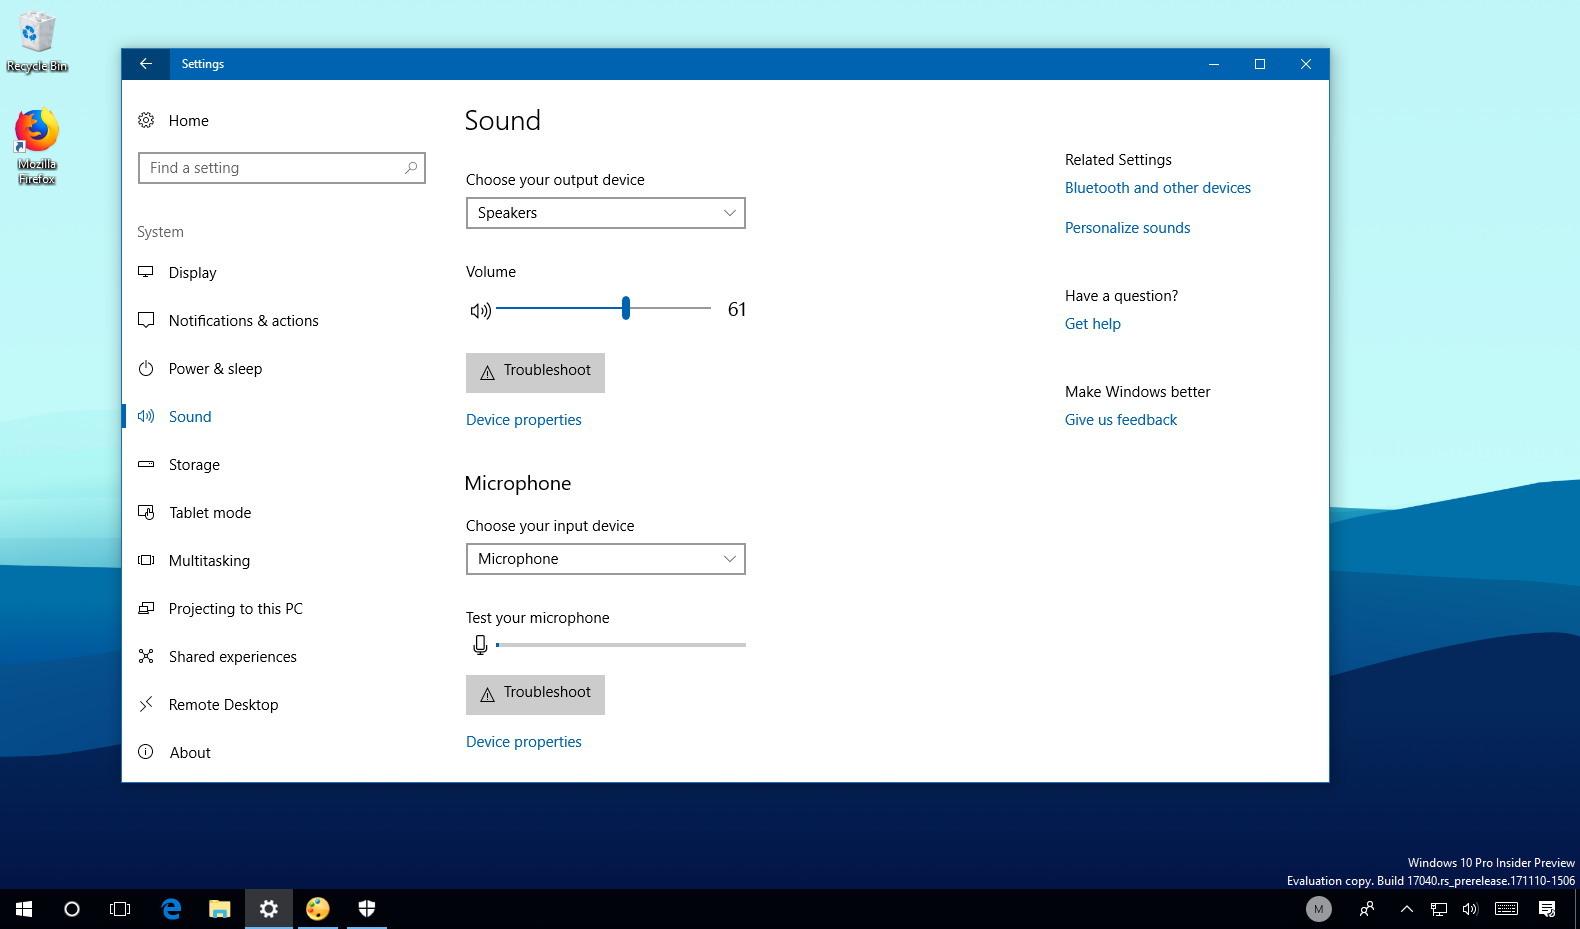 Sound settings on Windows 10 Redstone 4